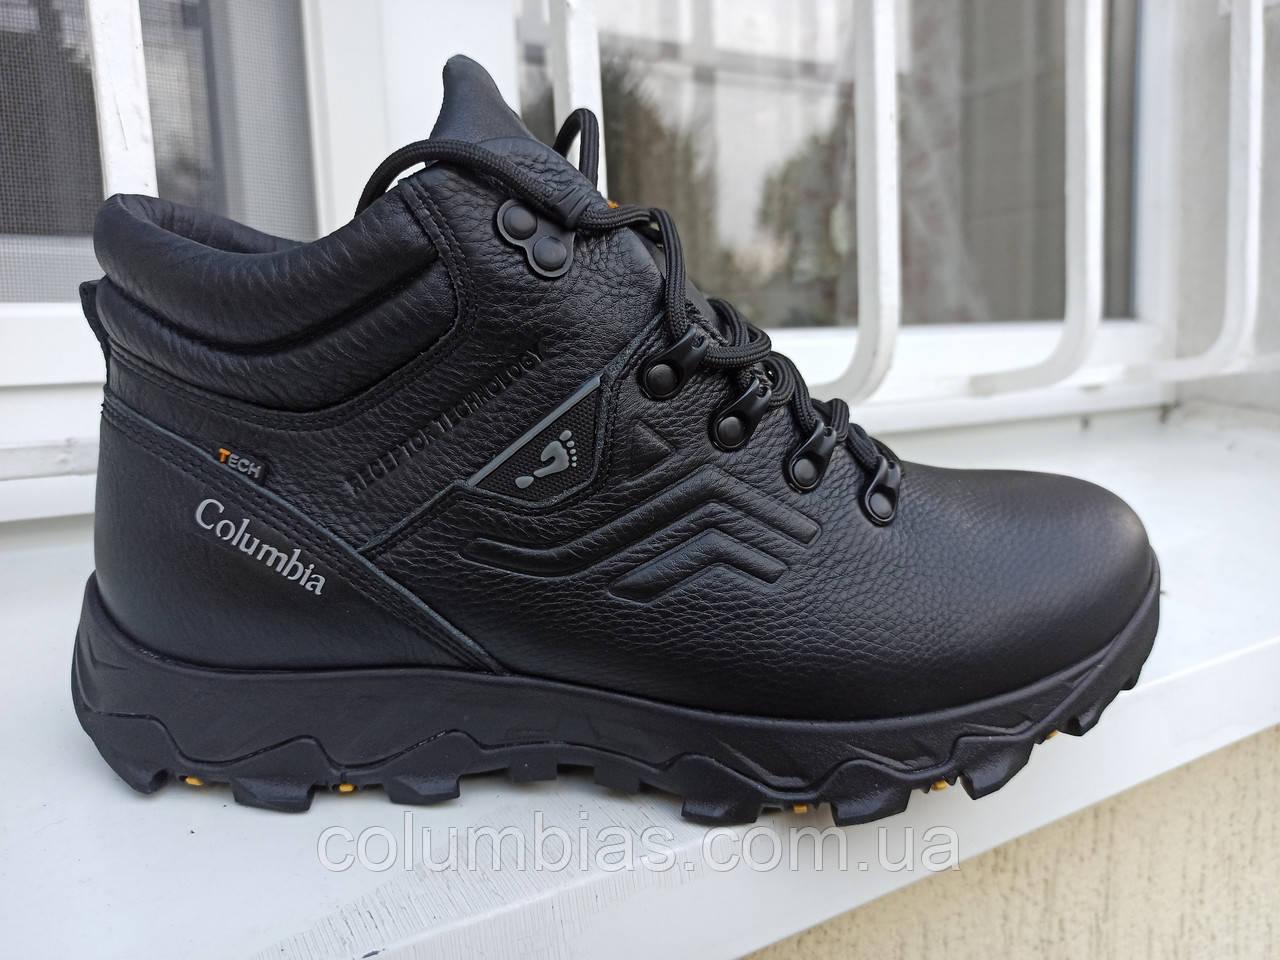 Зимние кожаные термо ботинки columbia termo